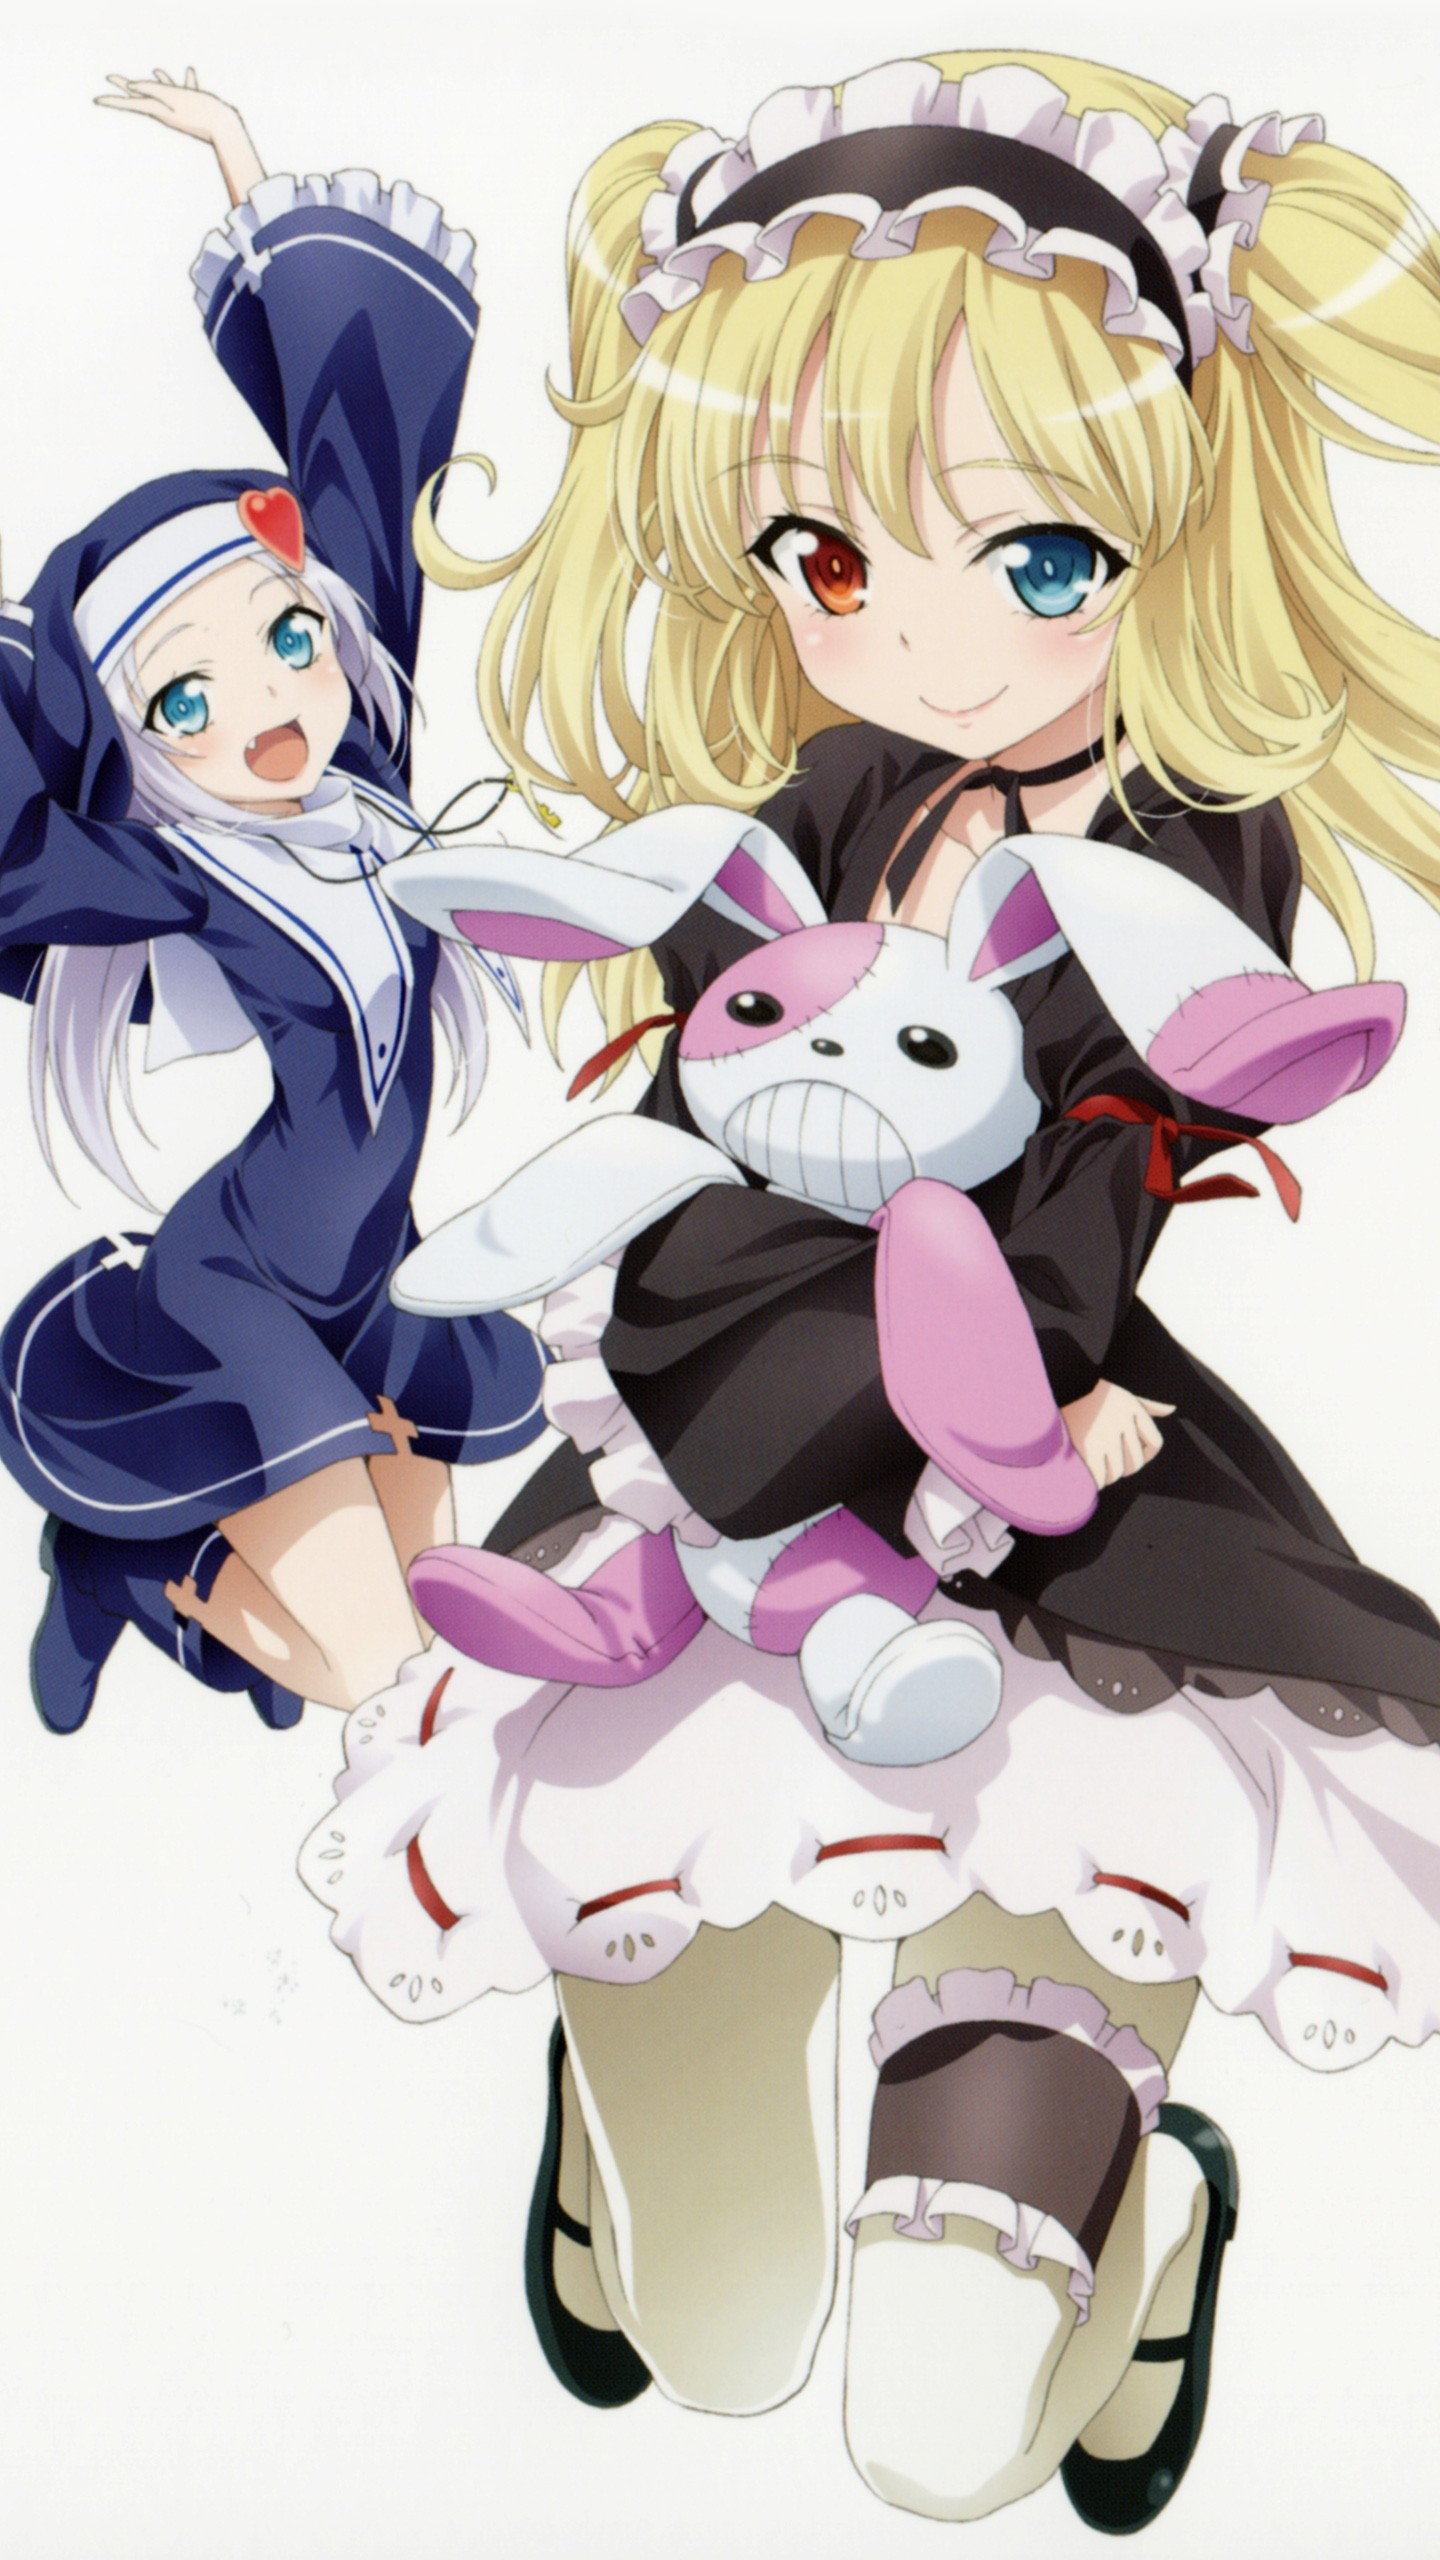 Anime 1440x2560 loli anime girls Hasegawa Kobato Takayama Maria Boku wa Tomodachi ga Sukunai heterochromia twintails gothic lolita